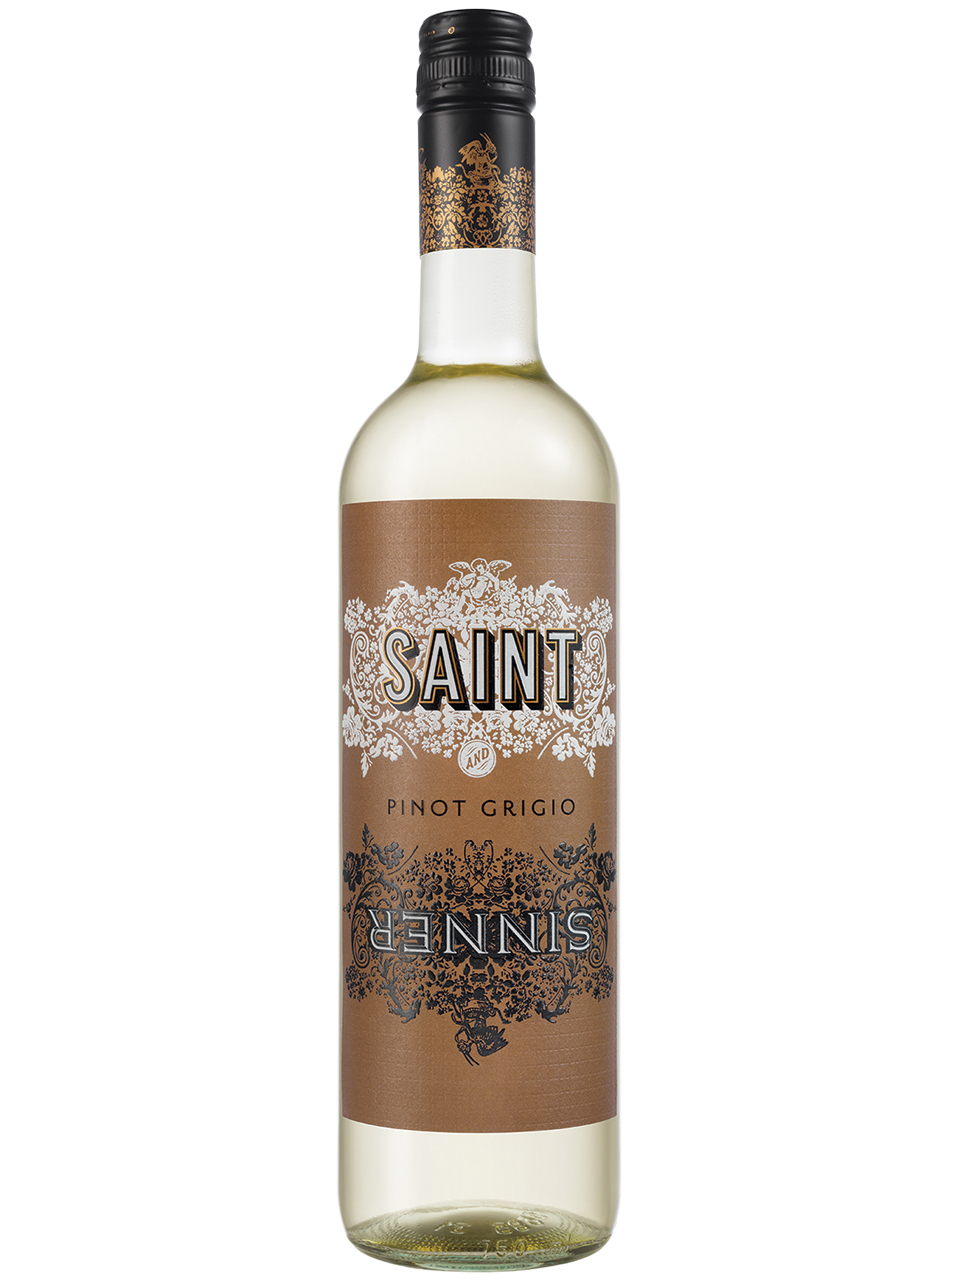 Saint & Sinner Pinot Grigio